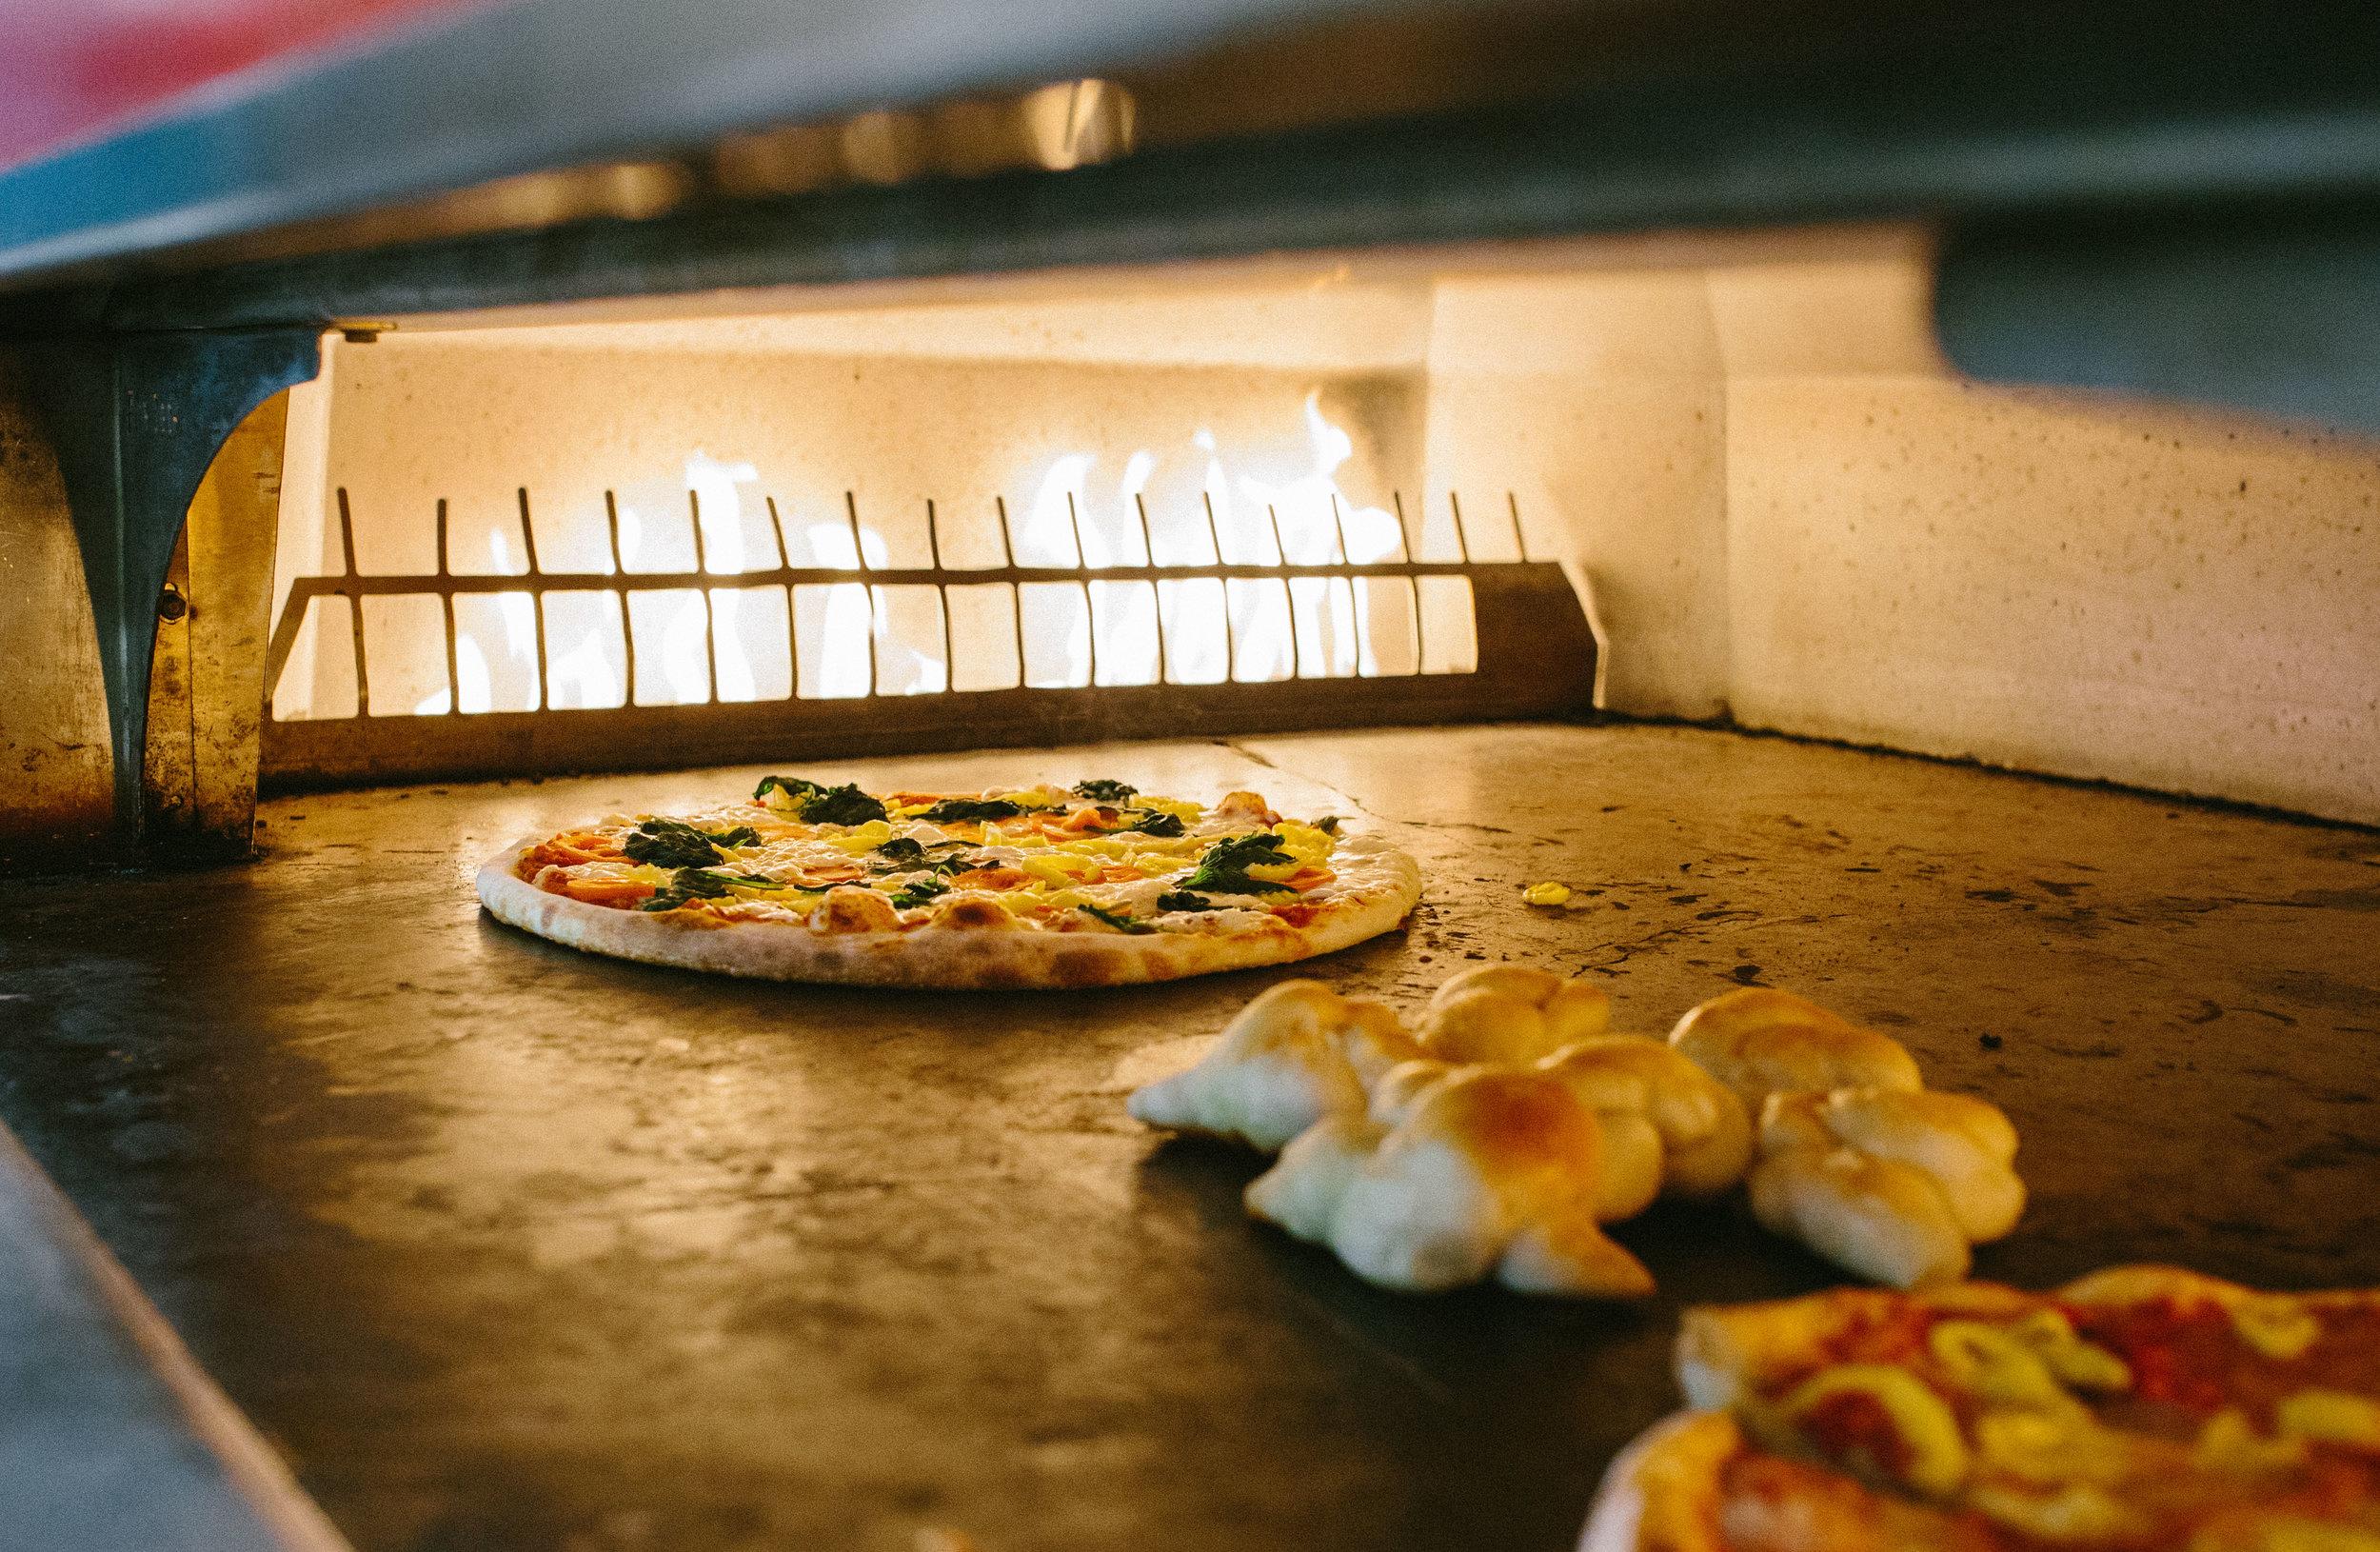 aracri-pizzeria-10.25-27.jpg